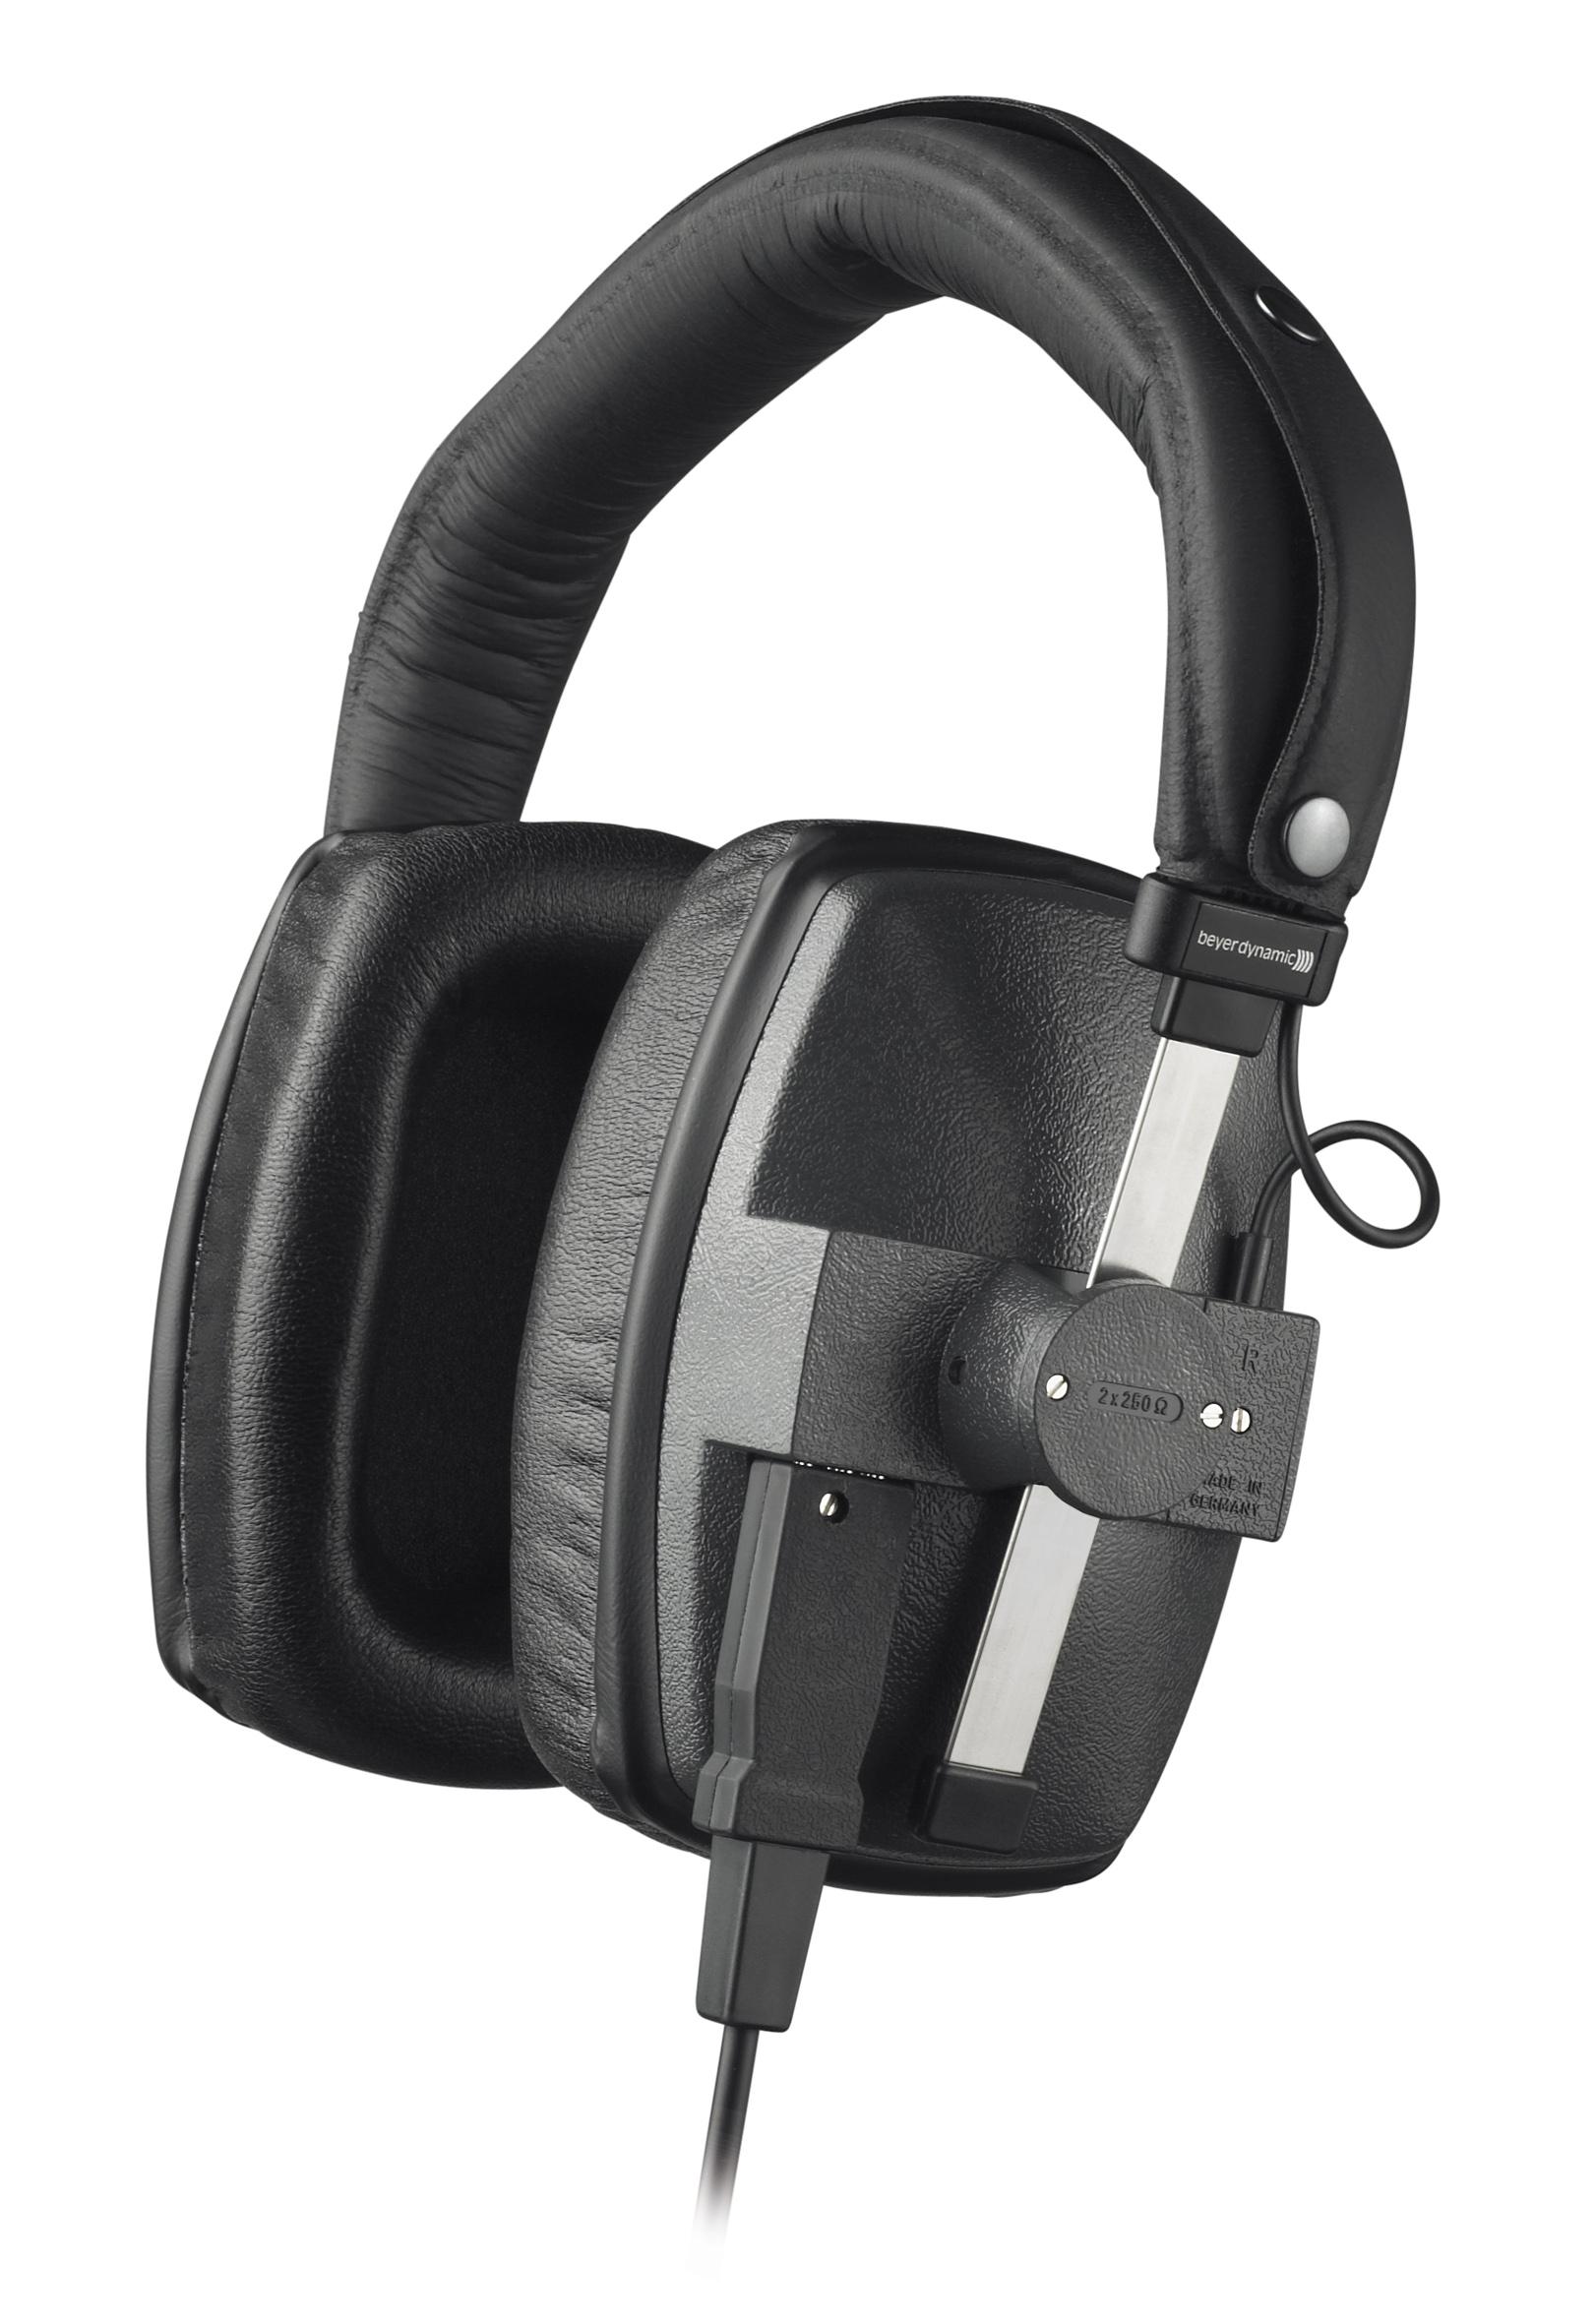 add31cbe4ff beyerynamic DT 150 Compact Closed Headphone (250 Ohms) | Headphone ...